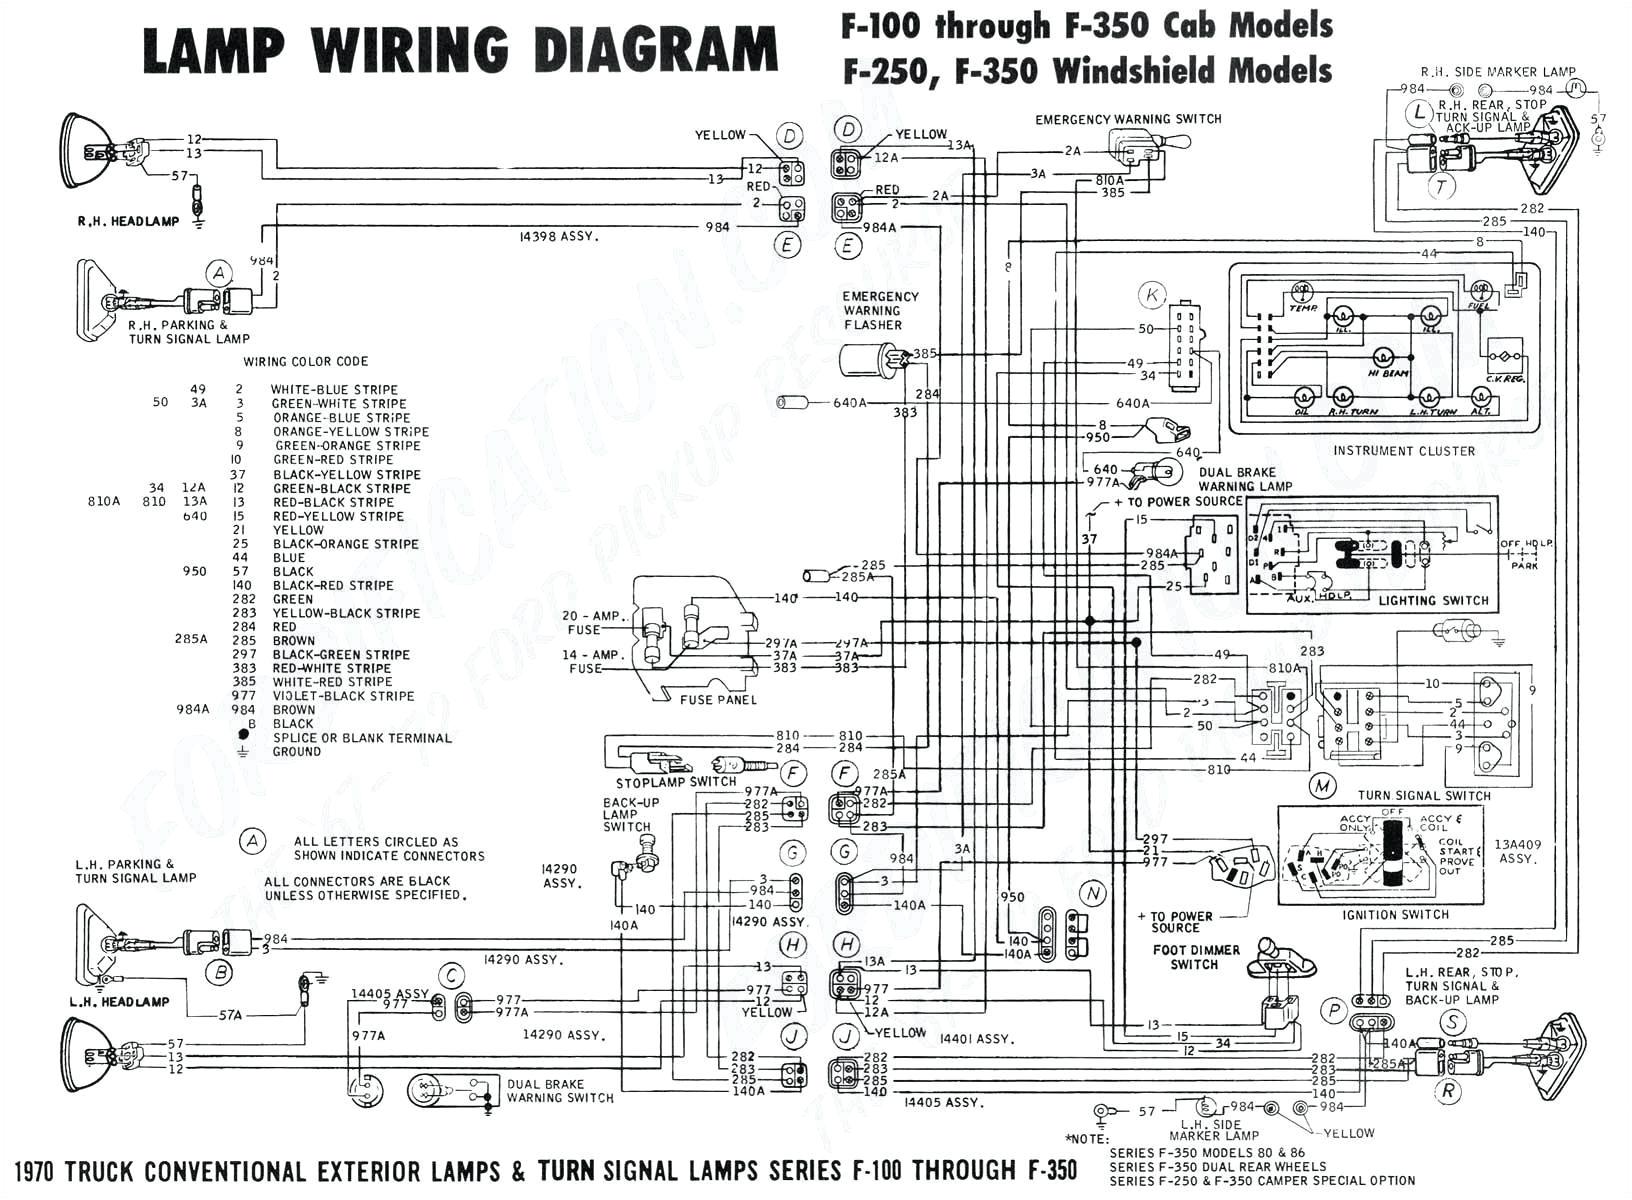 Generator Panel Wiring Diagram Generator Wire Diagram Wiring Diagram Technic